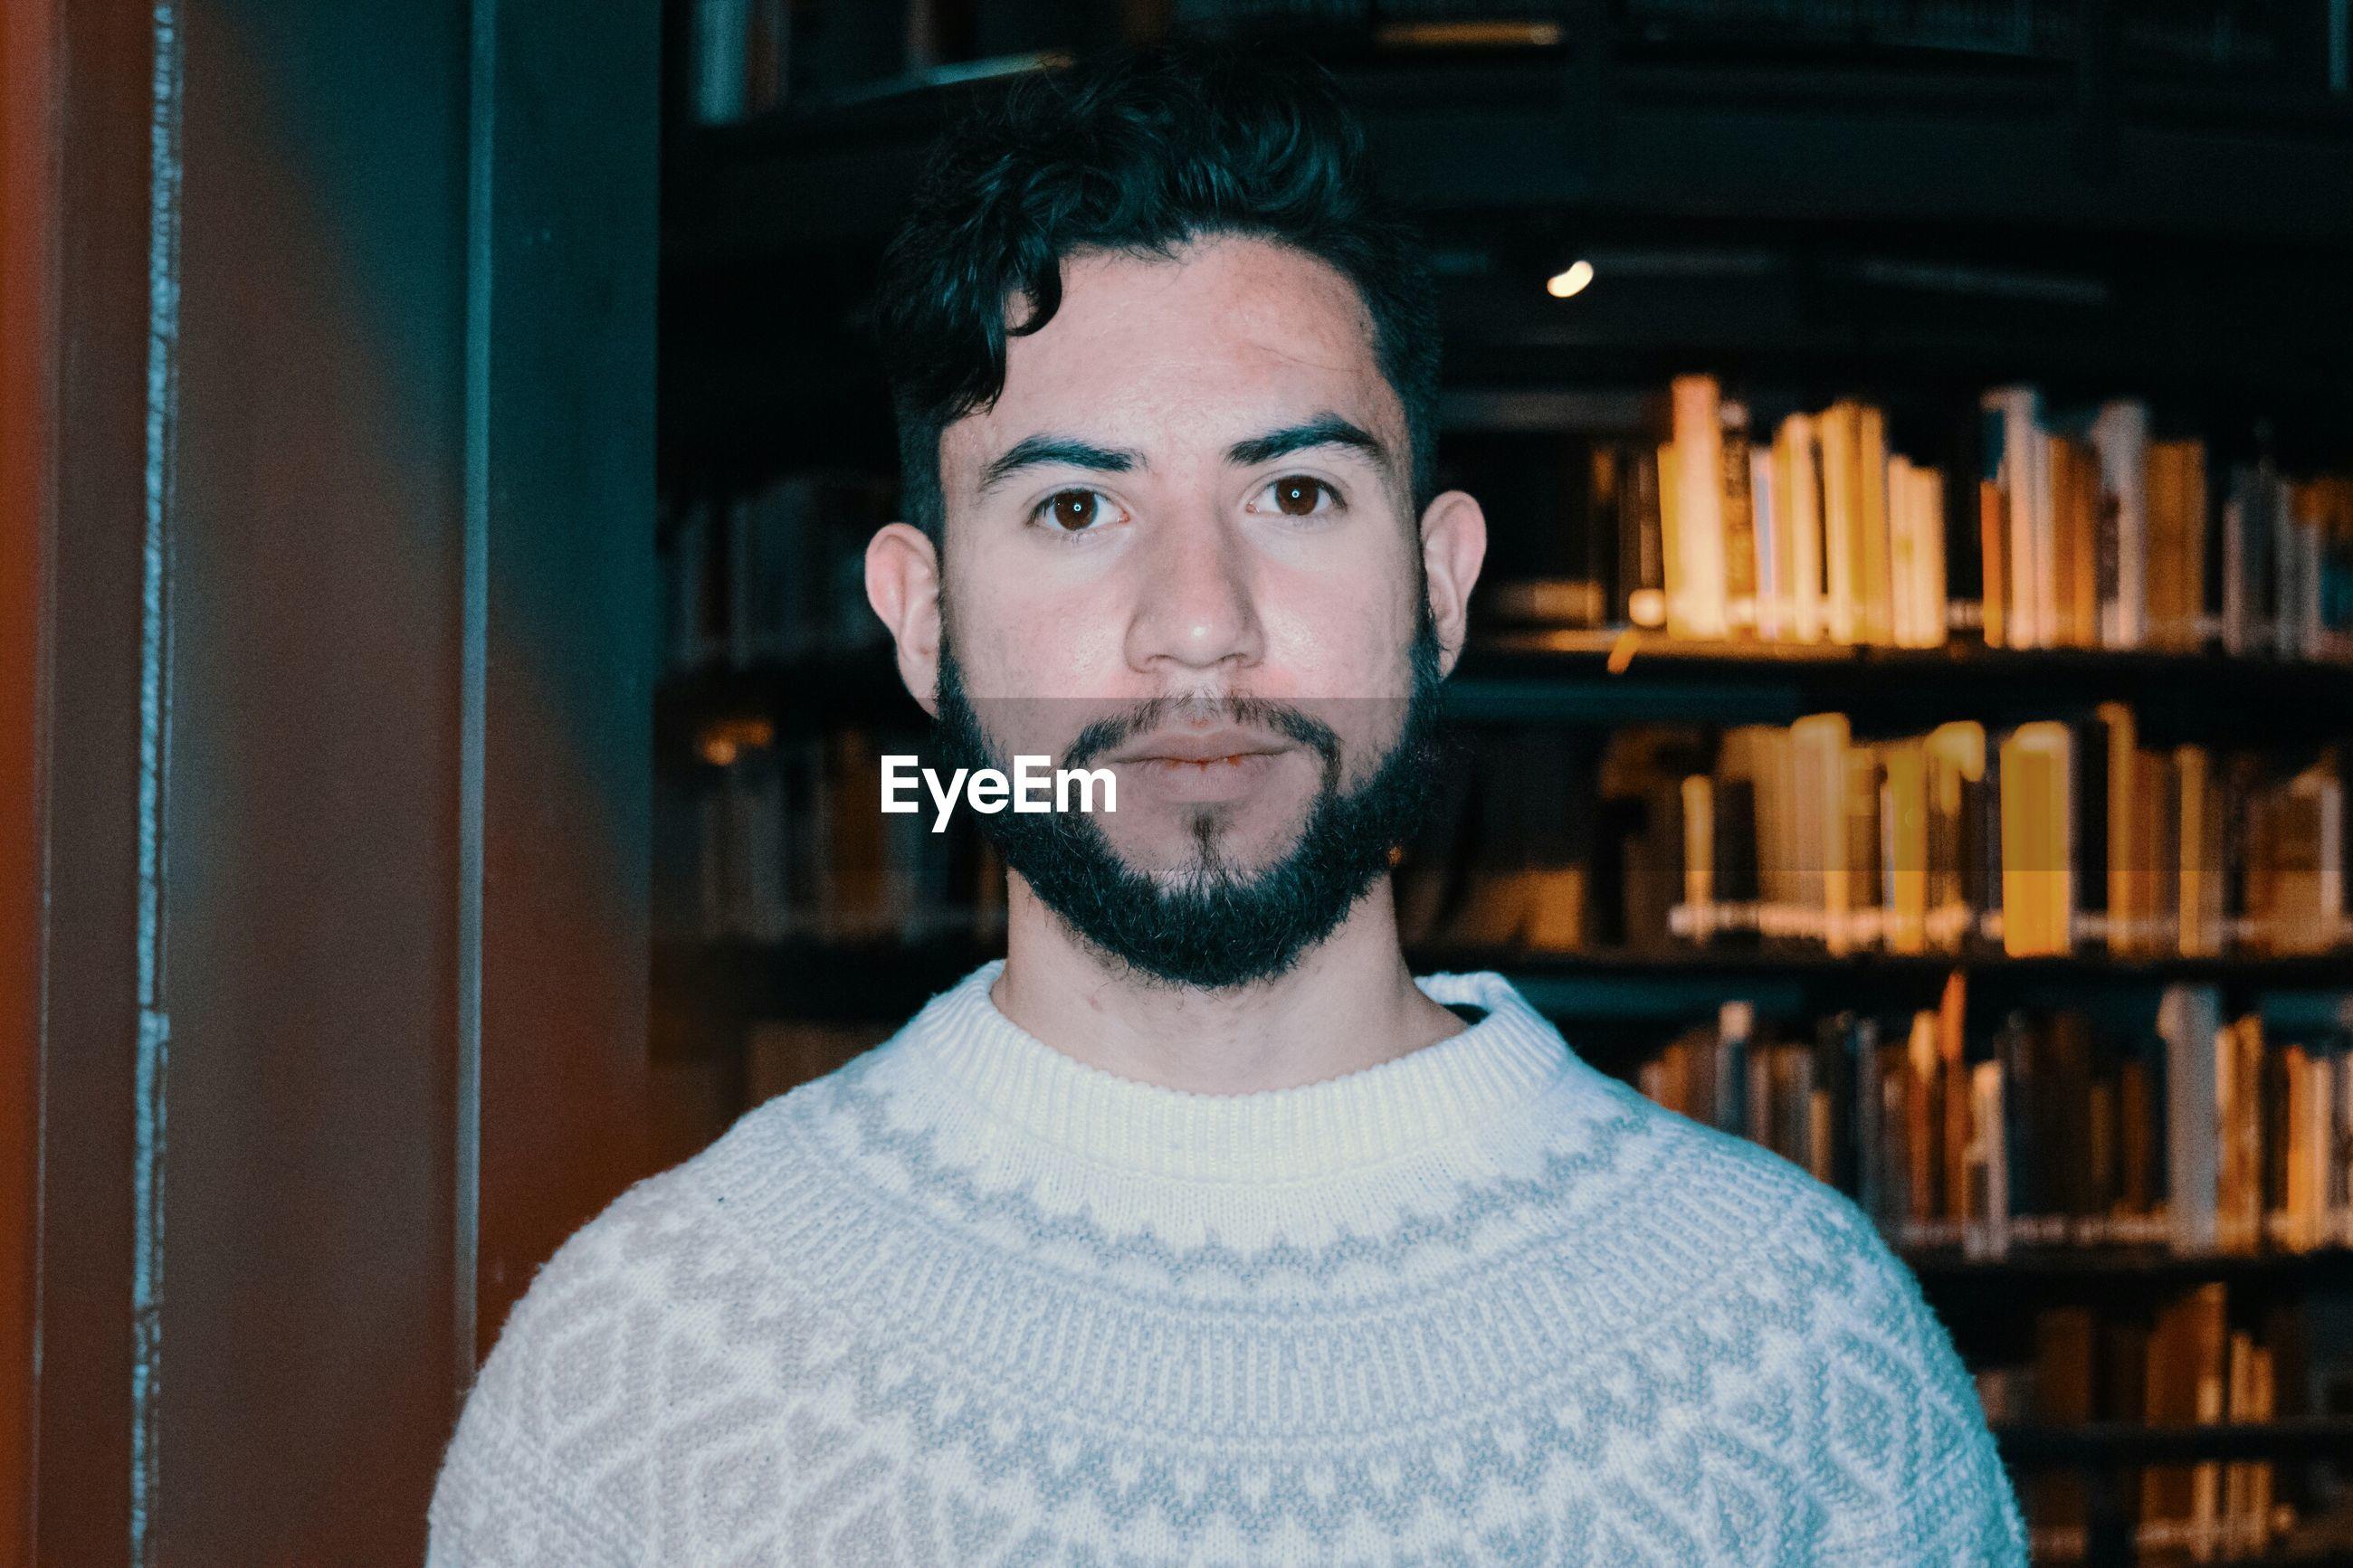 Portrait of young man against bookshelf